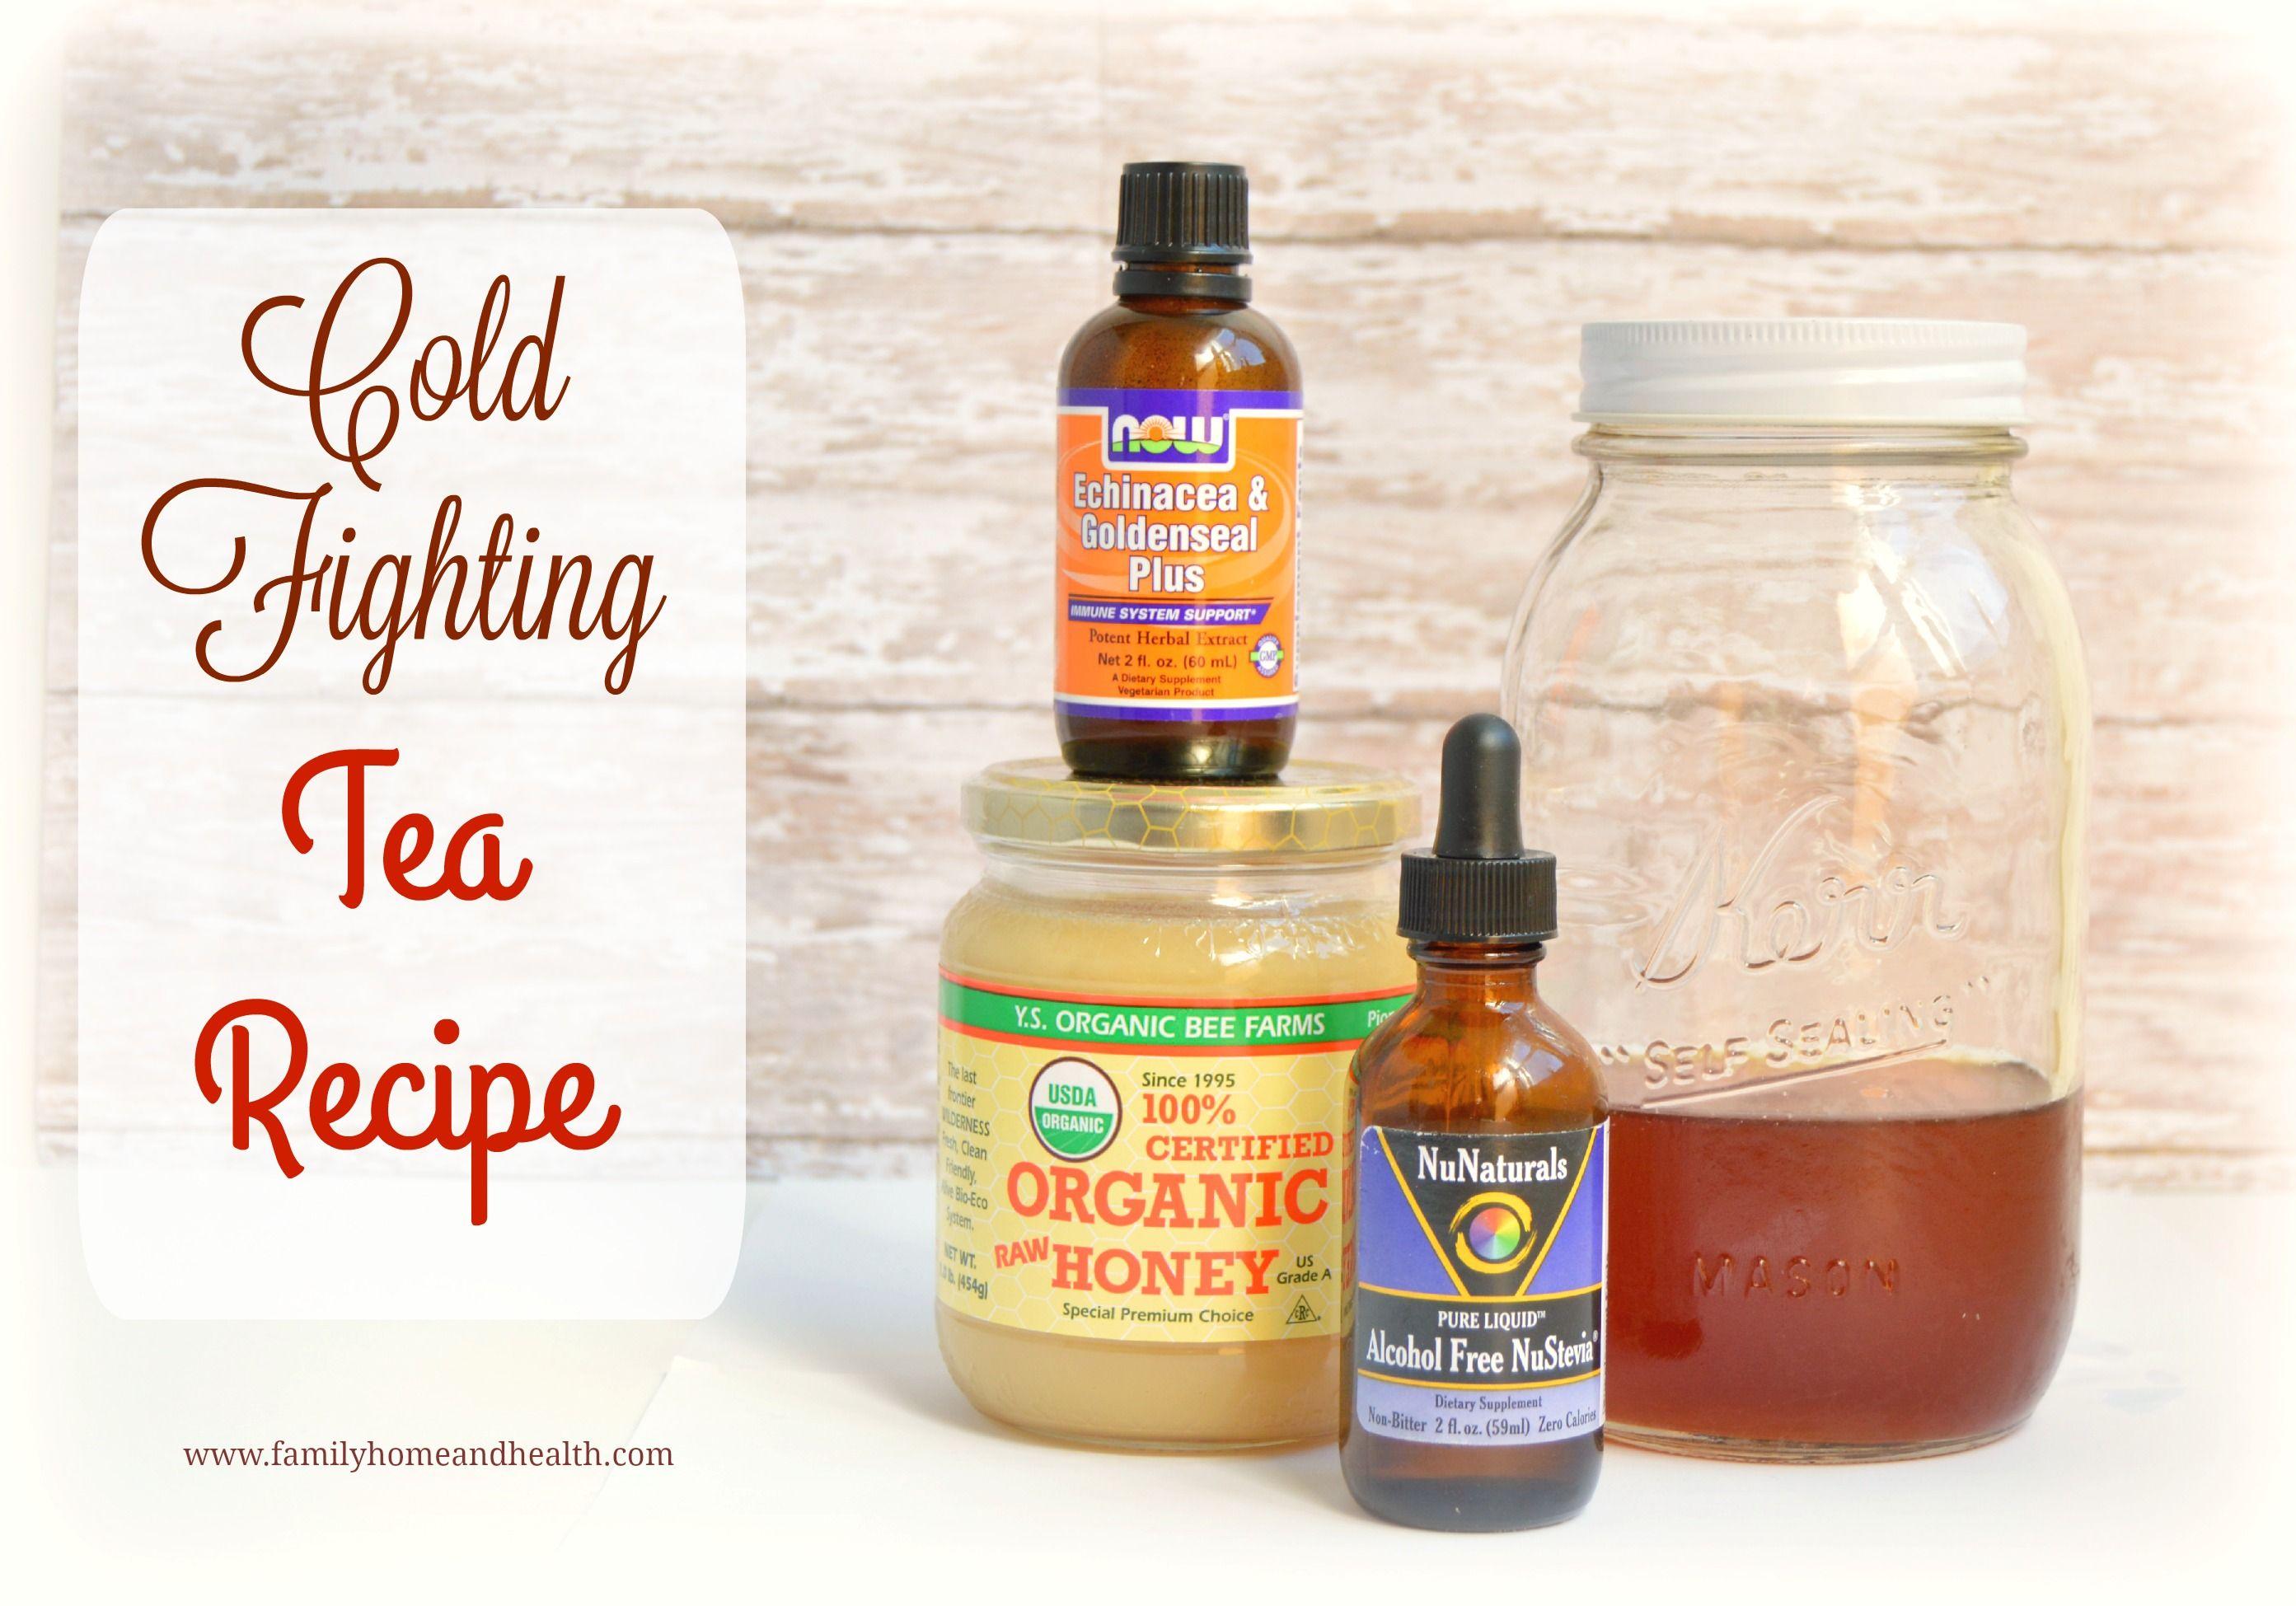 Cold fighting tea recipe family home and health tea